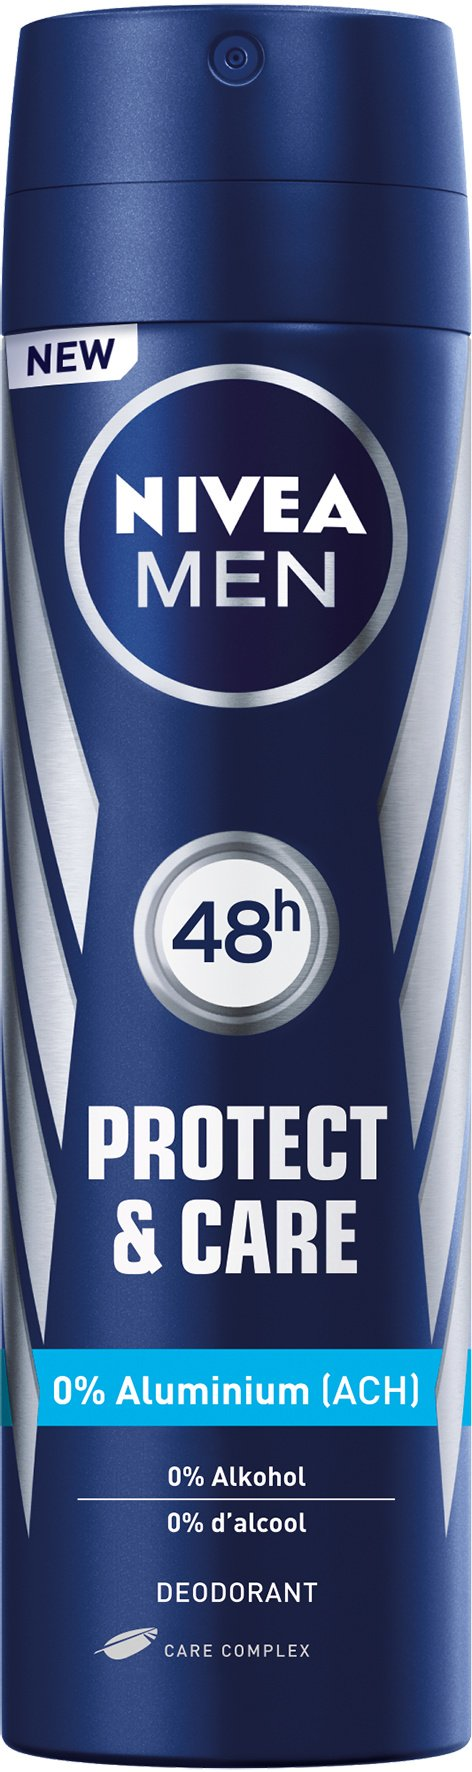 NIVEA MEN Protect & Care Deo Spray